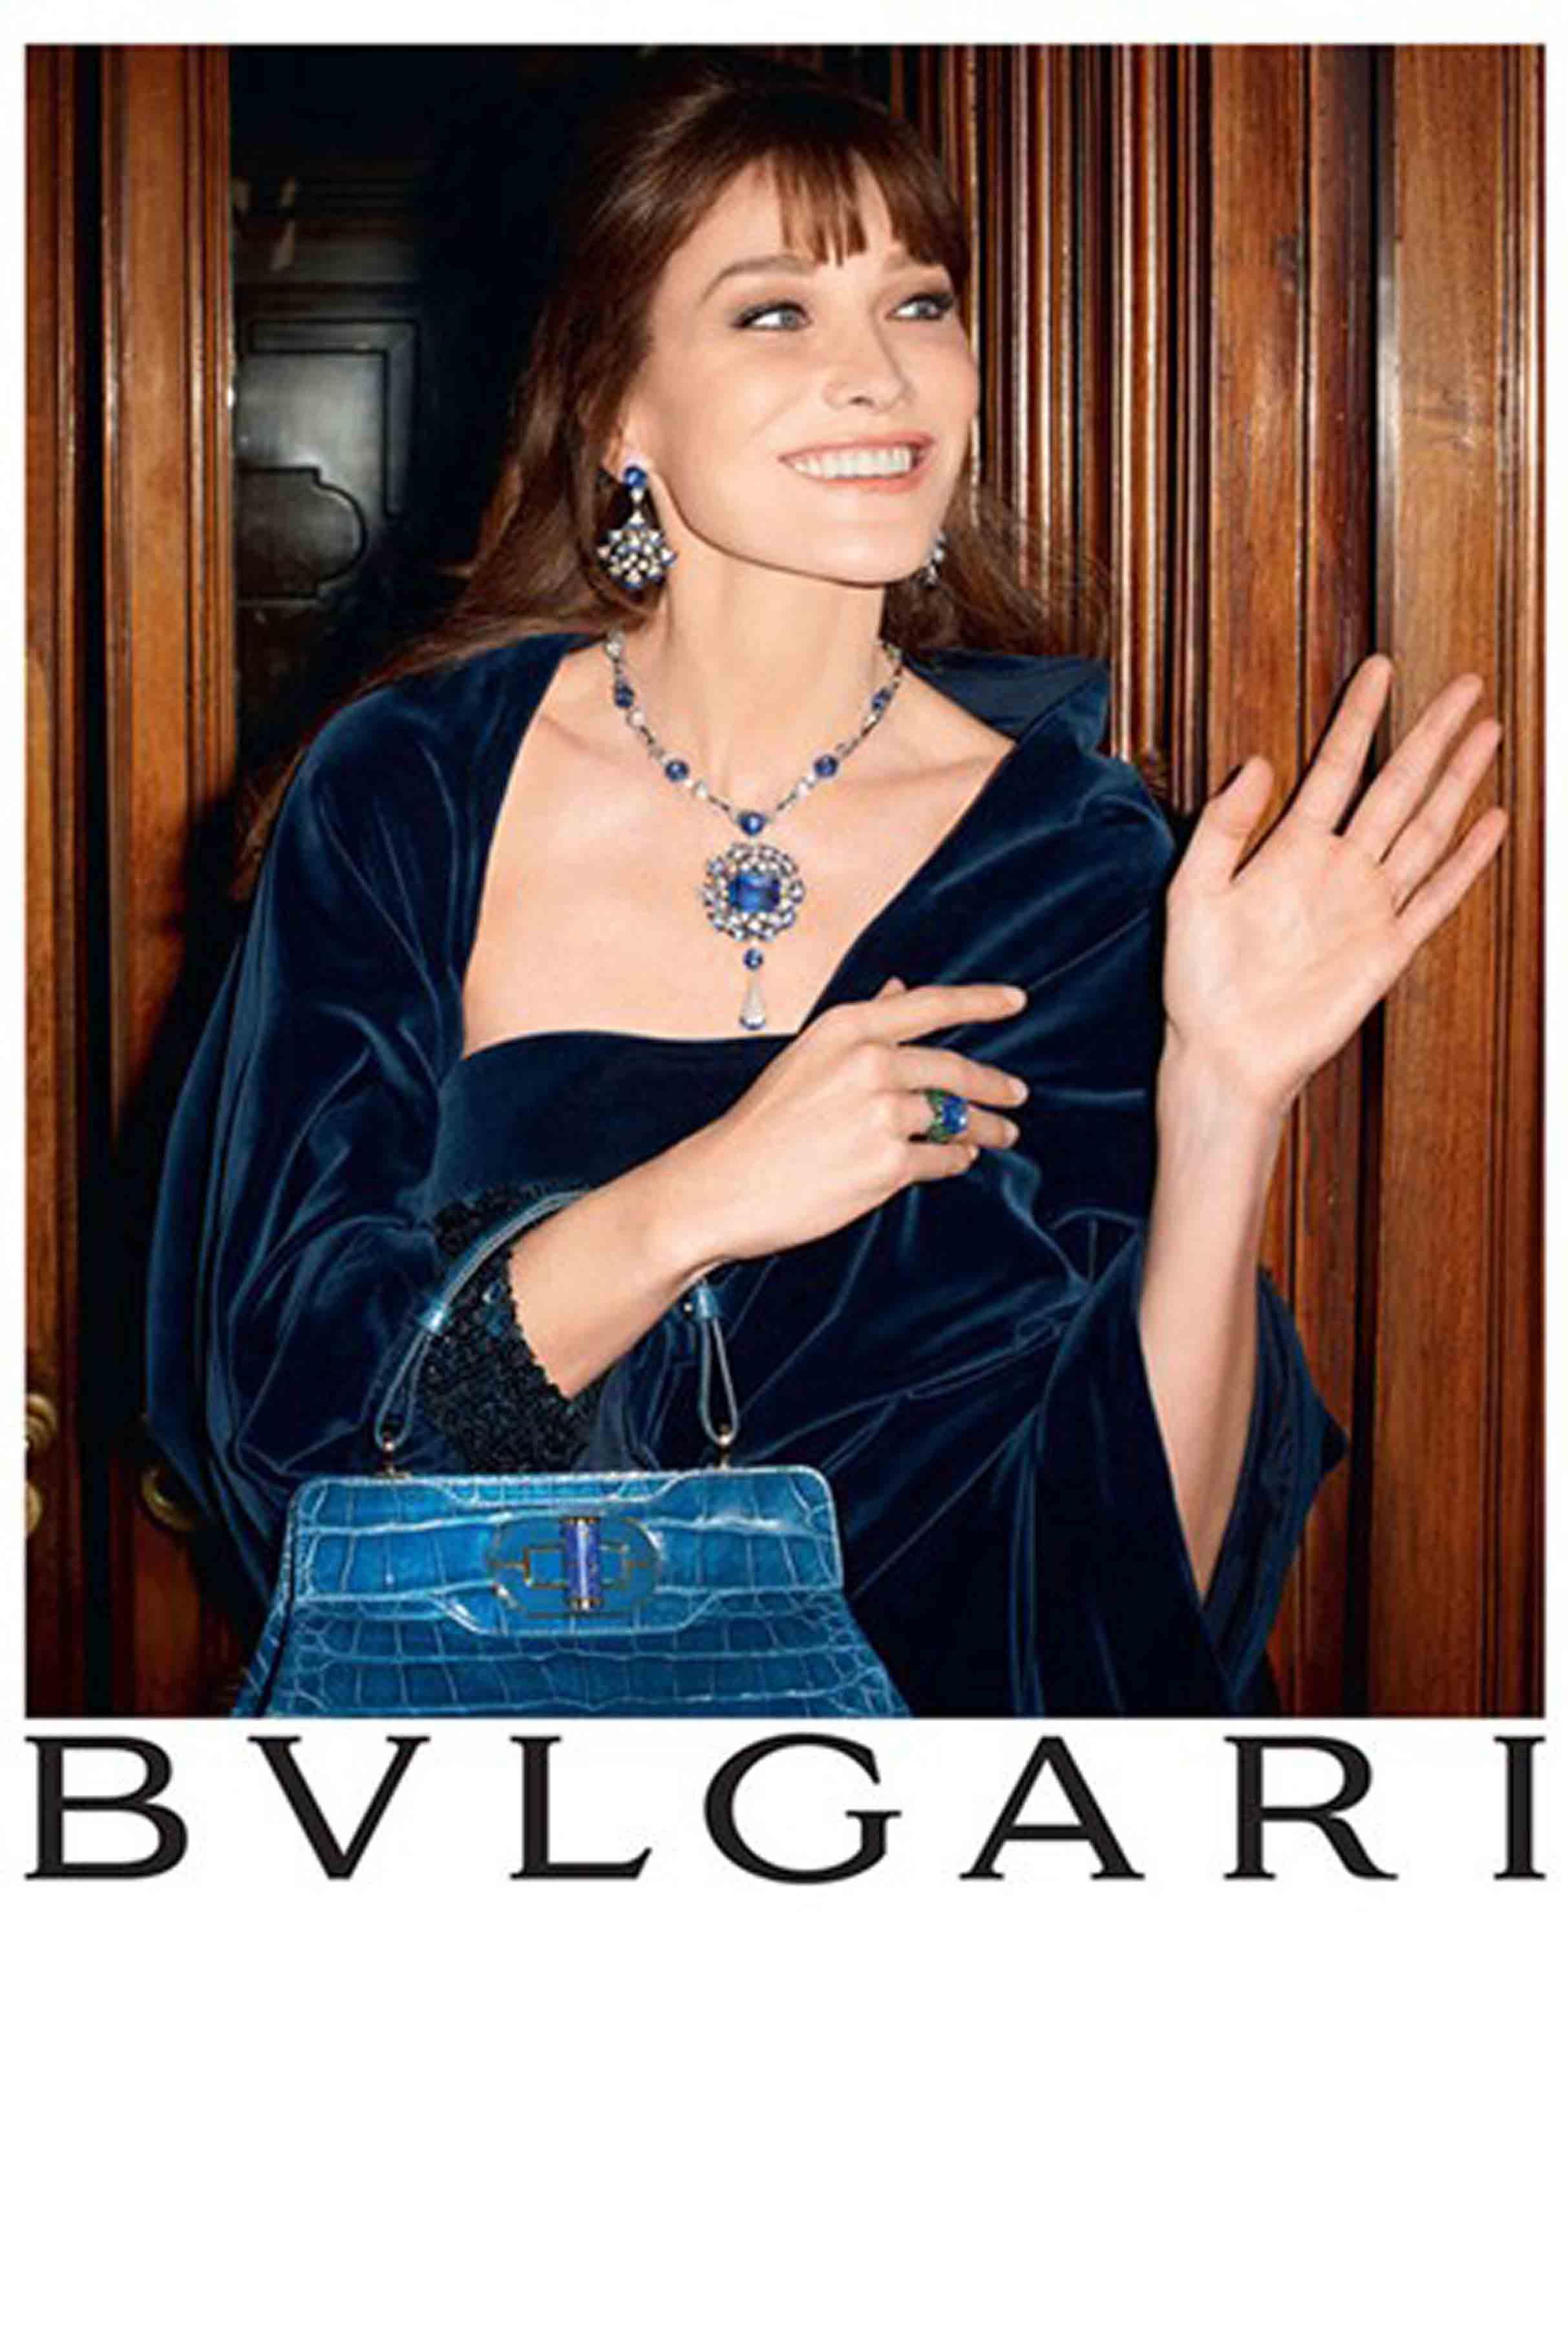 bulgari5